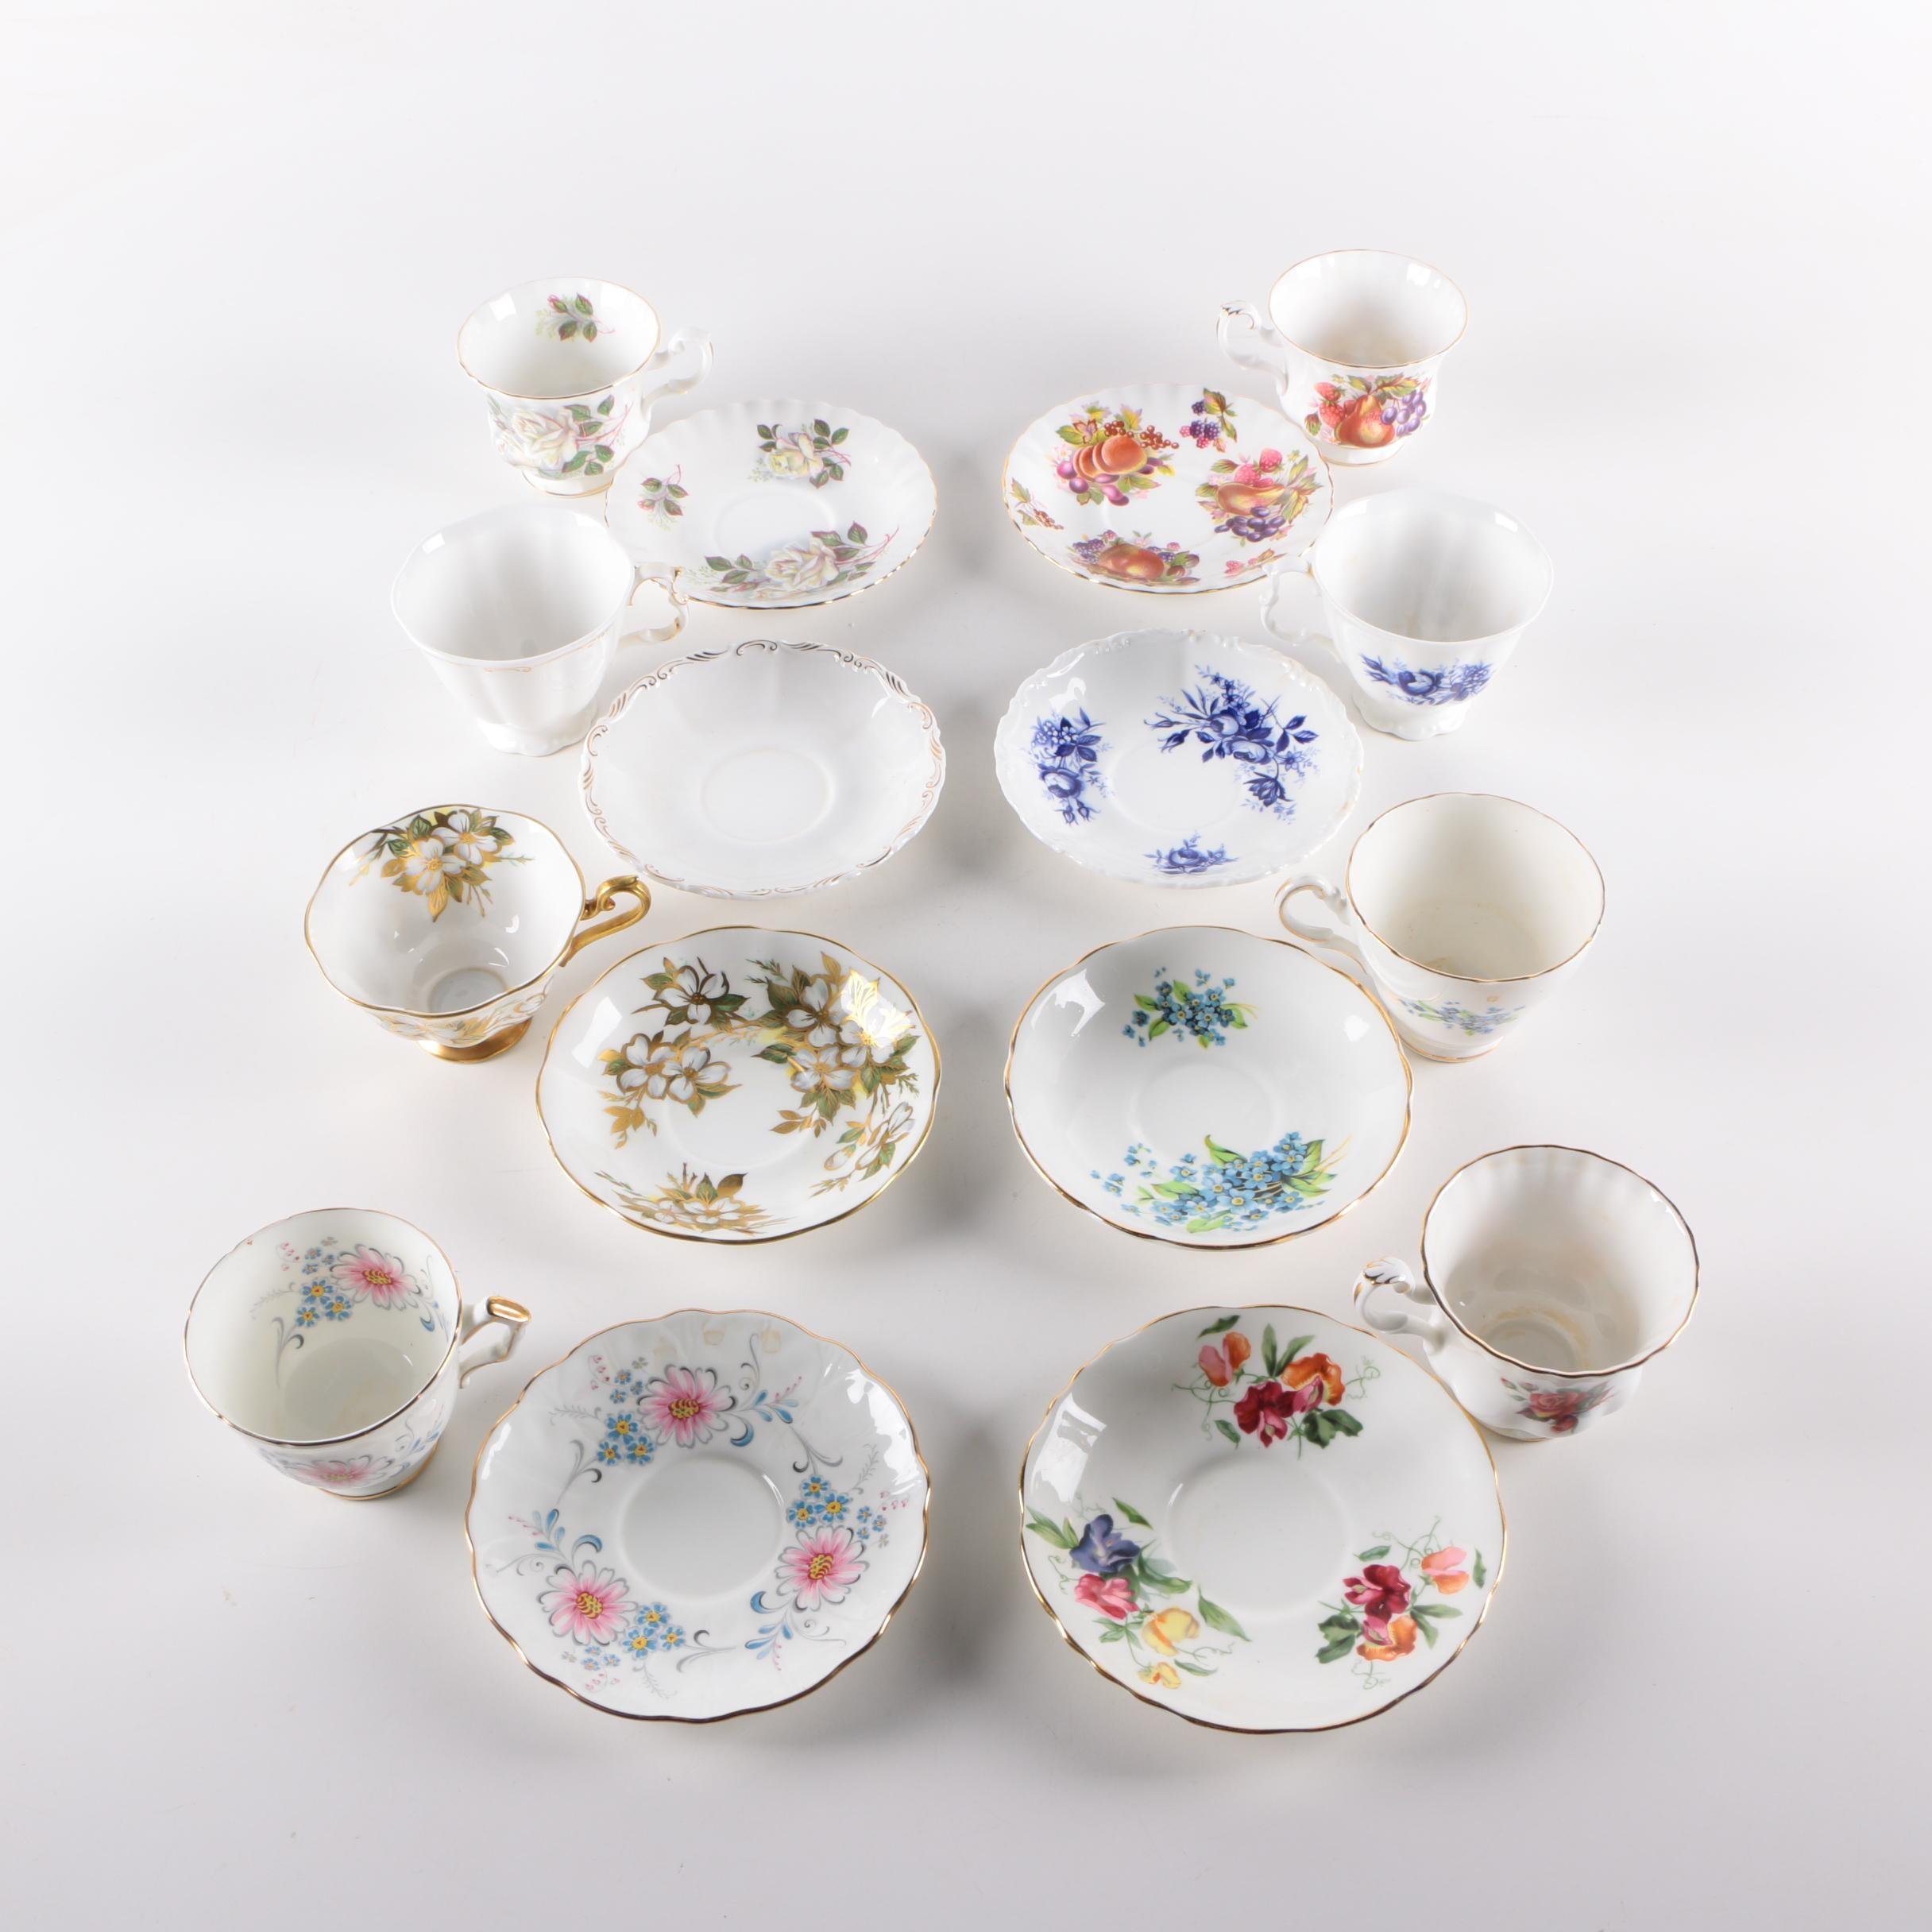 Teacups and Saucers Featuring Royal Albert